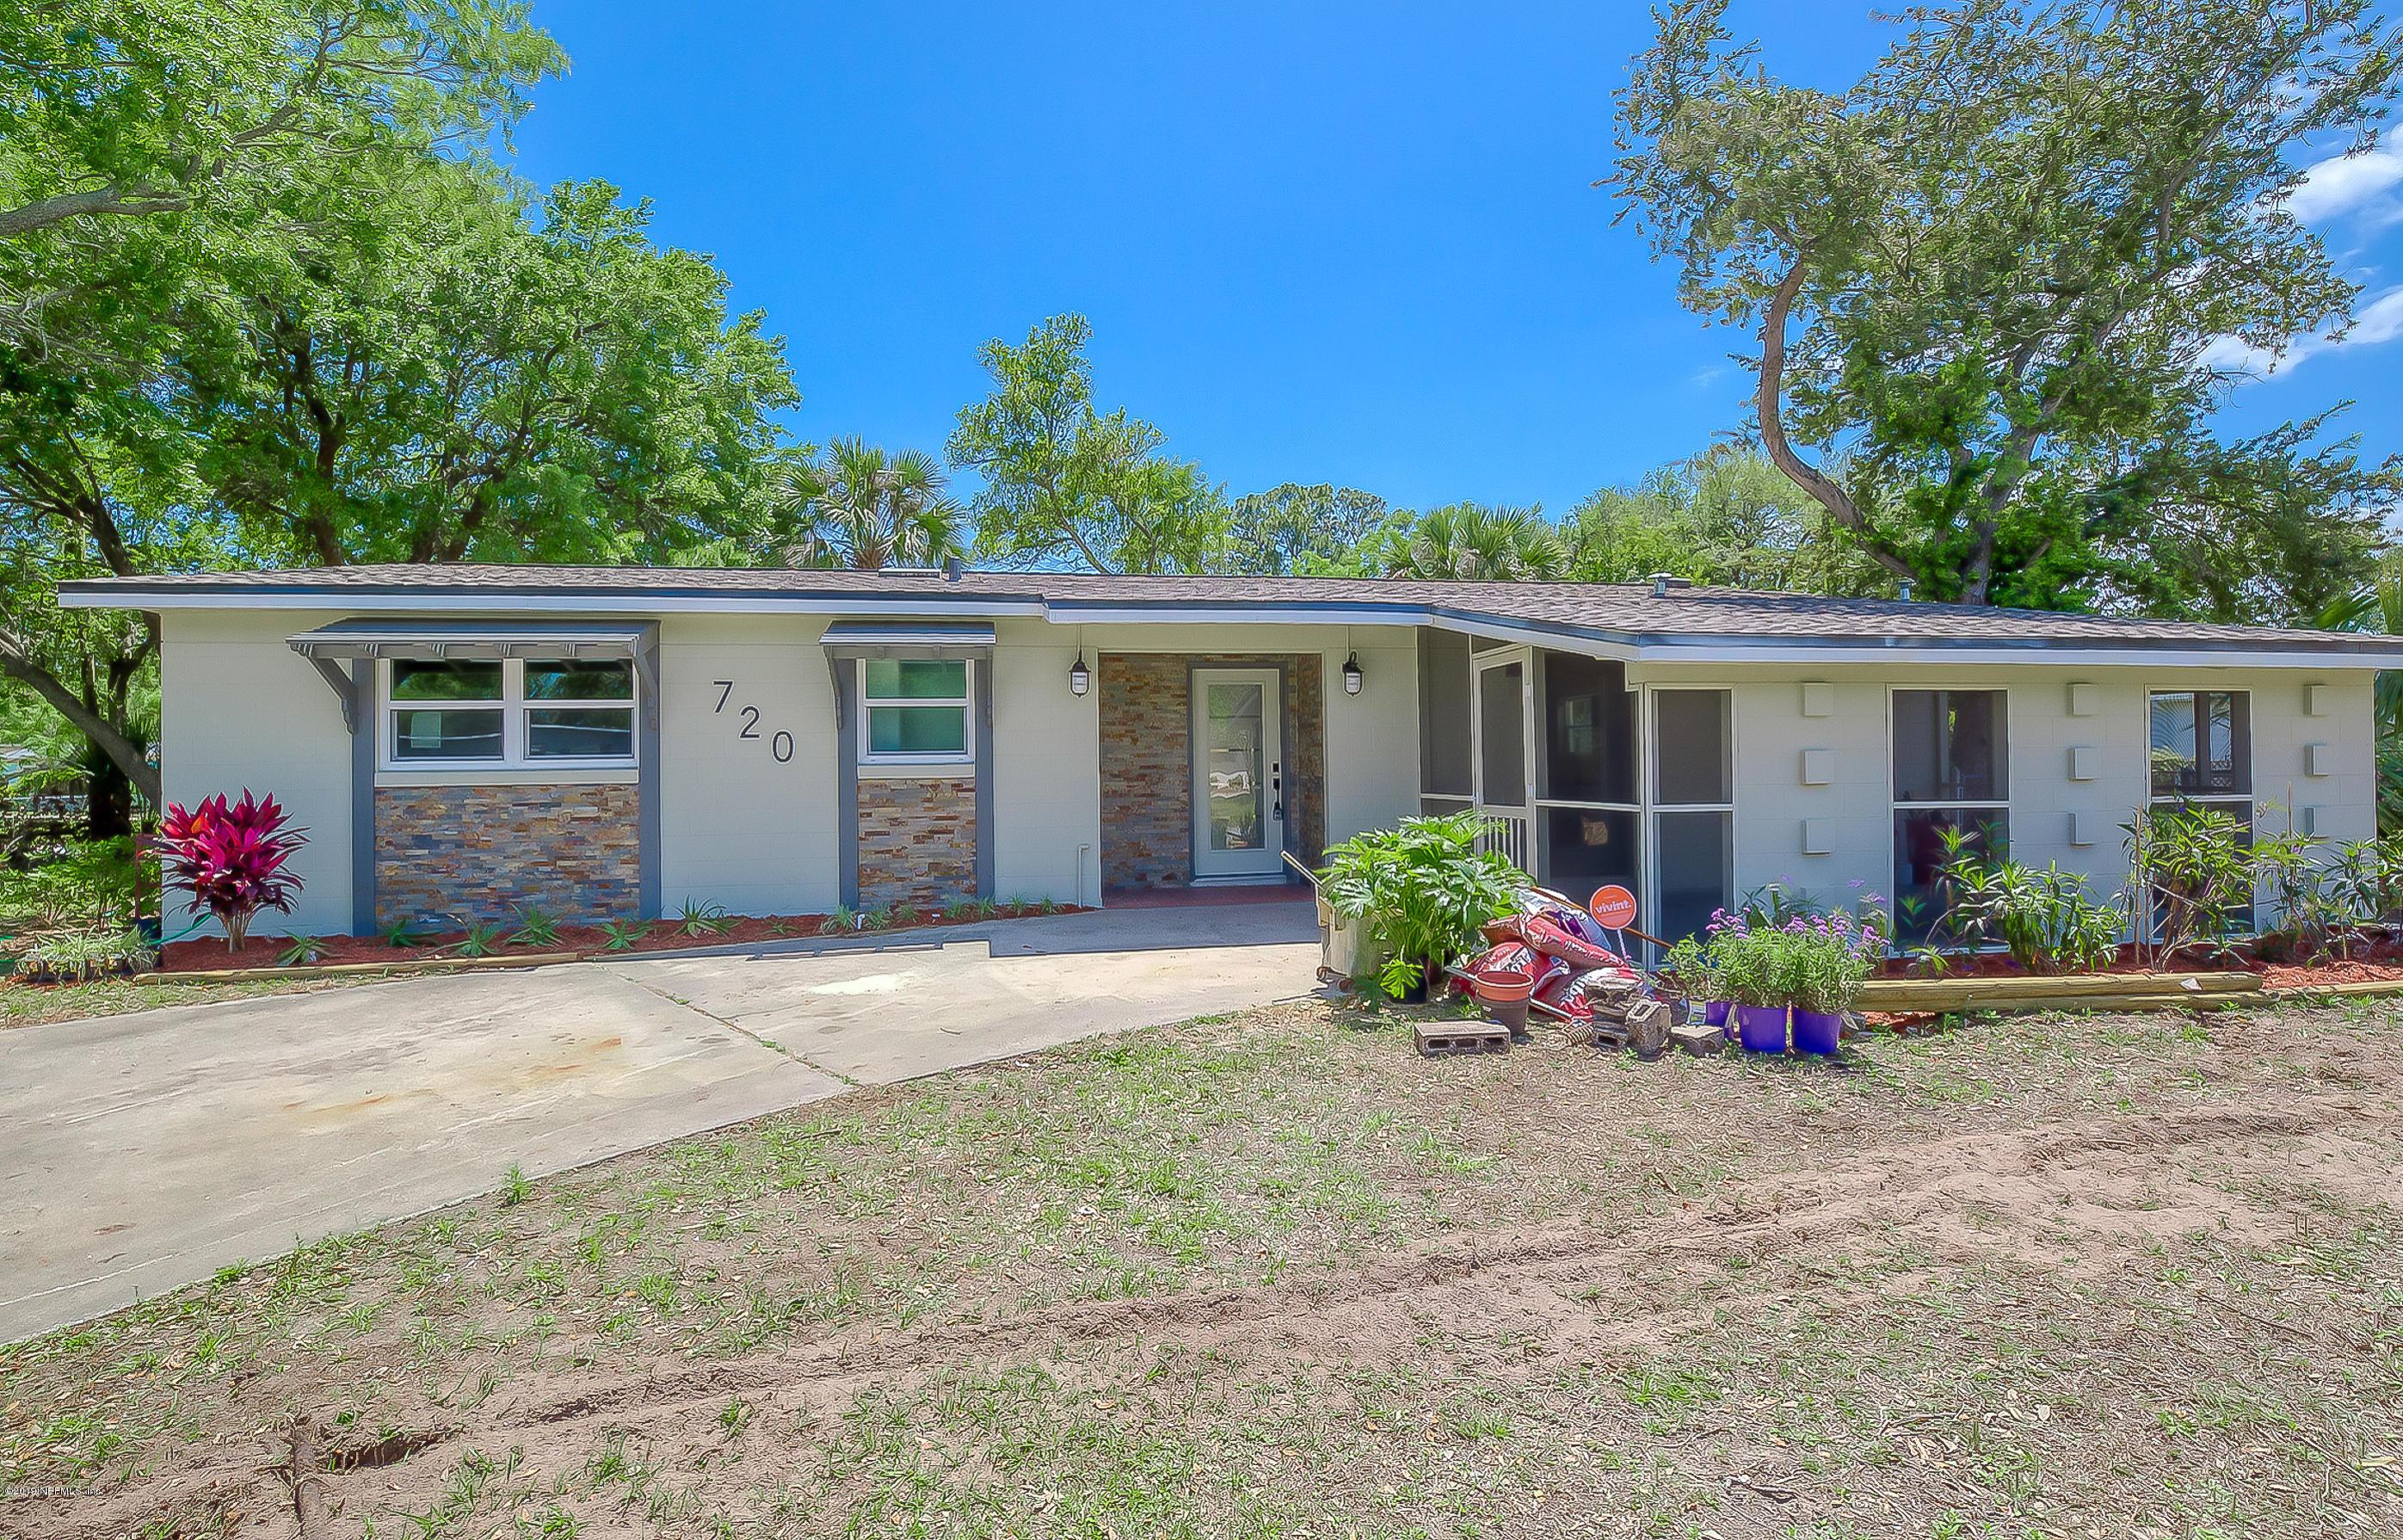 720 SABALO, ATLANTIC BEACH, FLORIDA 32233, 3 Bedrooms Bedrooms, ,2 BathroomsBathrooms,Residential - single family,For sale,SABALO,990796